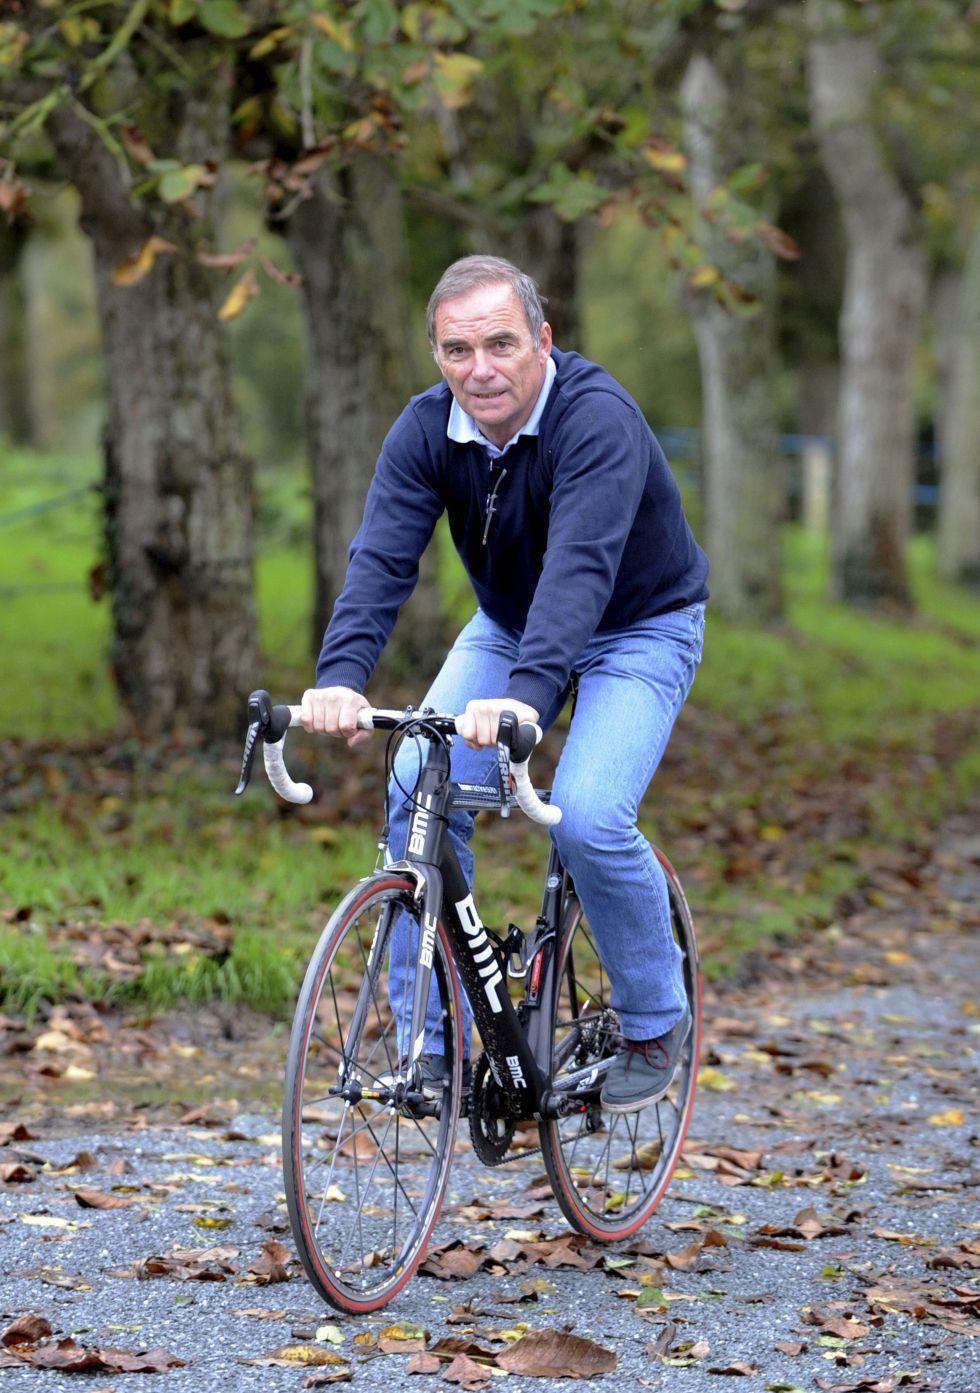 Giro de Italia 2015 1430956662_924130_1430956841_noticia_grande